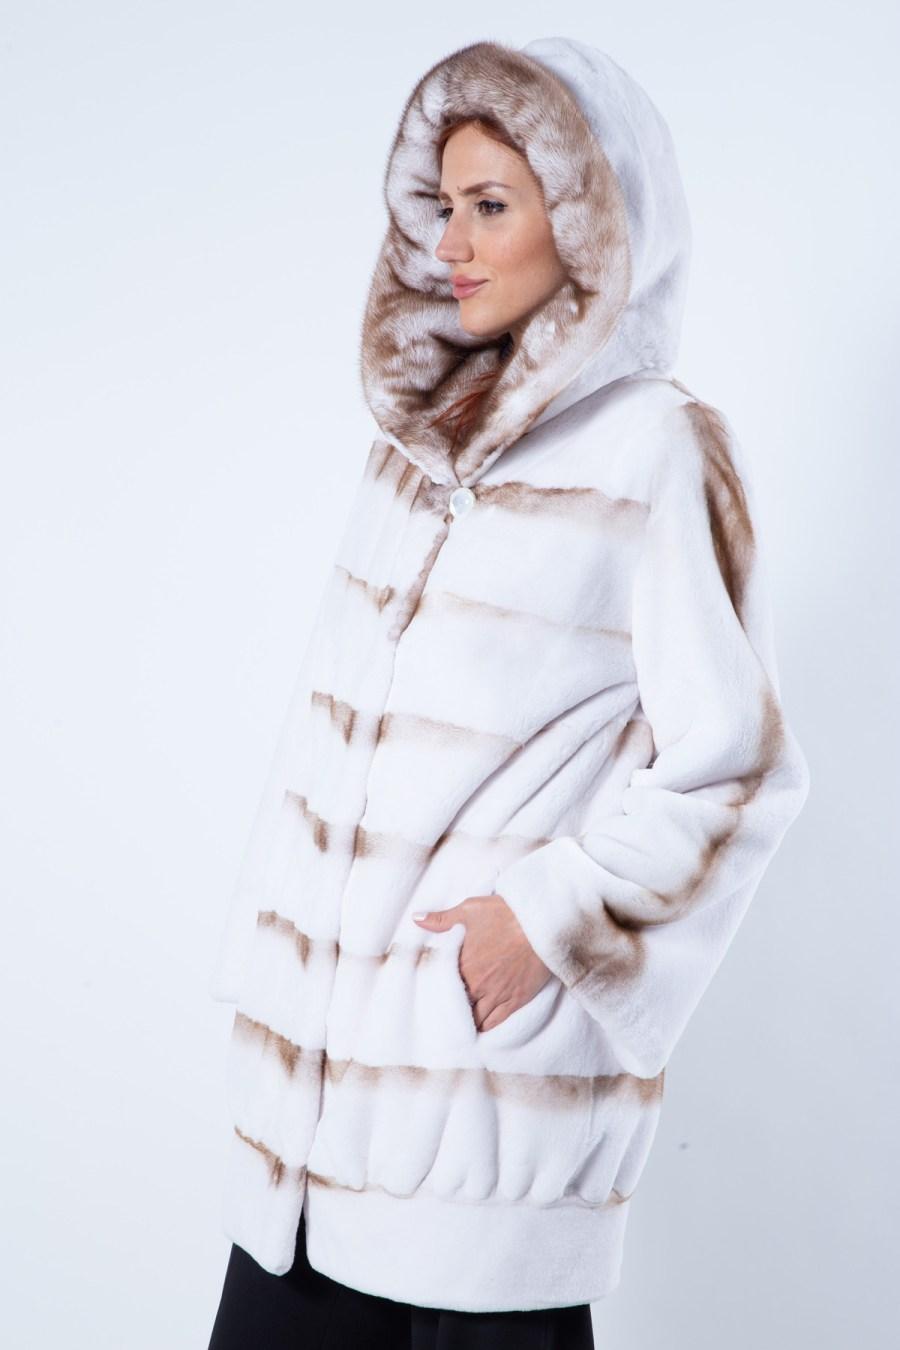 Goldwhite Sheared Mink Jacket with Hood   Пальто из меха стриженной норки цвета Goldwhite с капюшоном - Sarigianni Furs